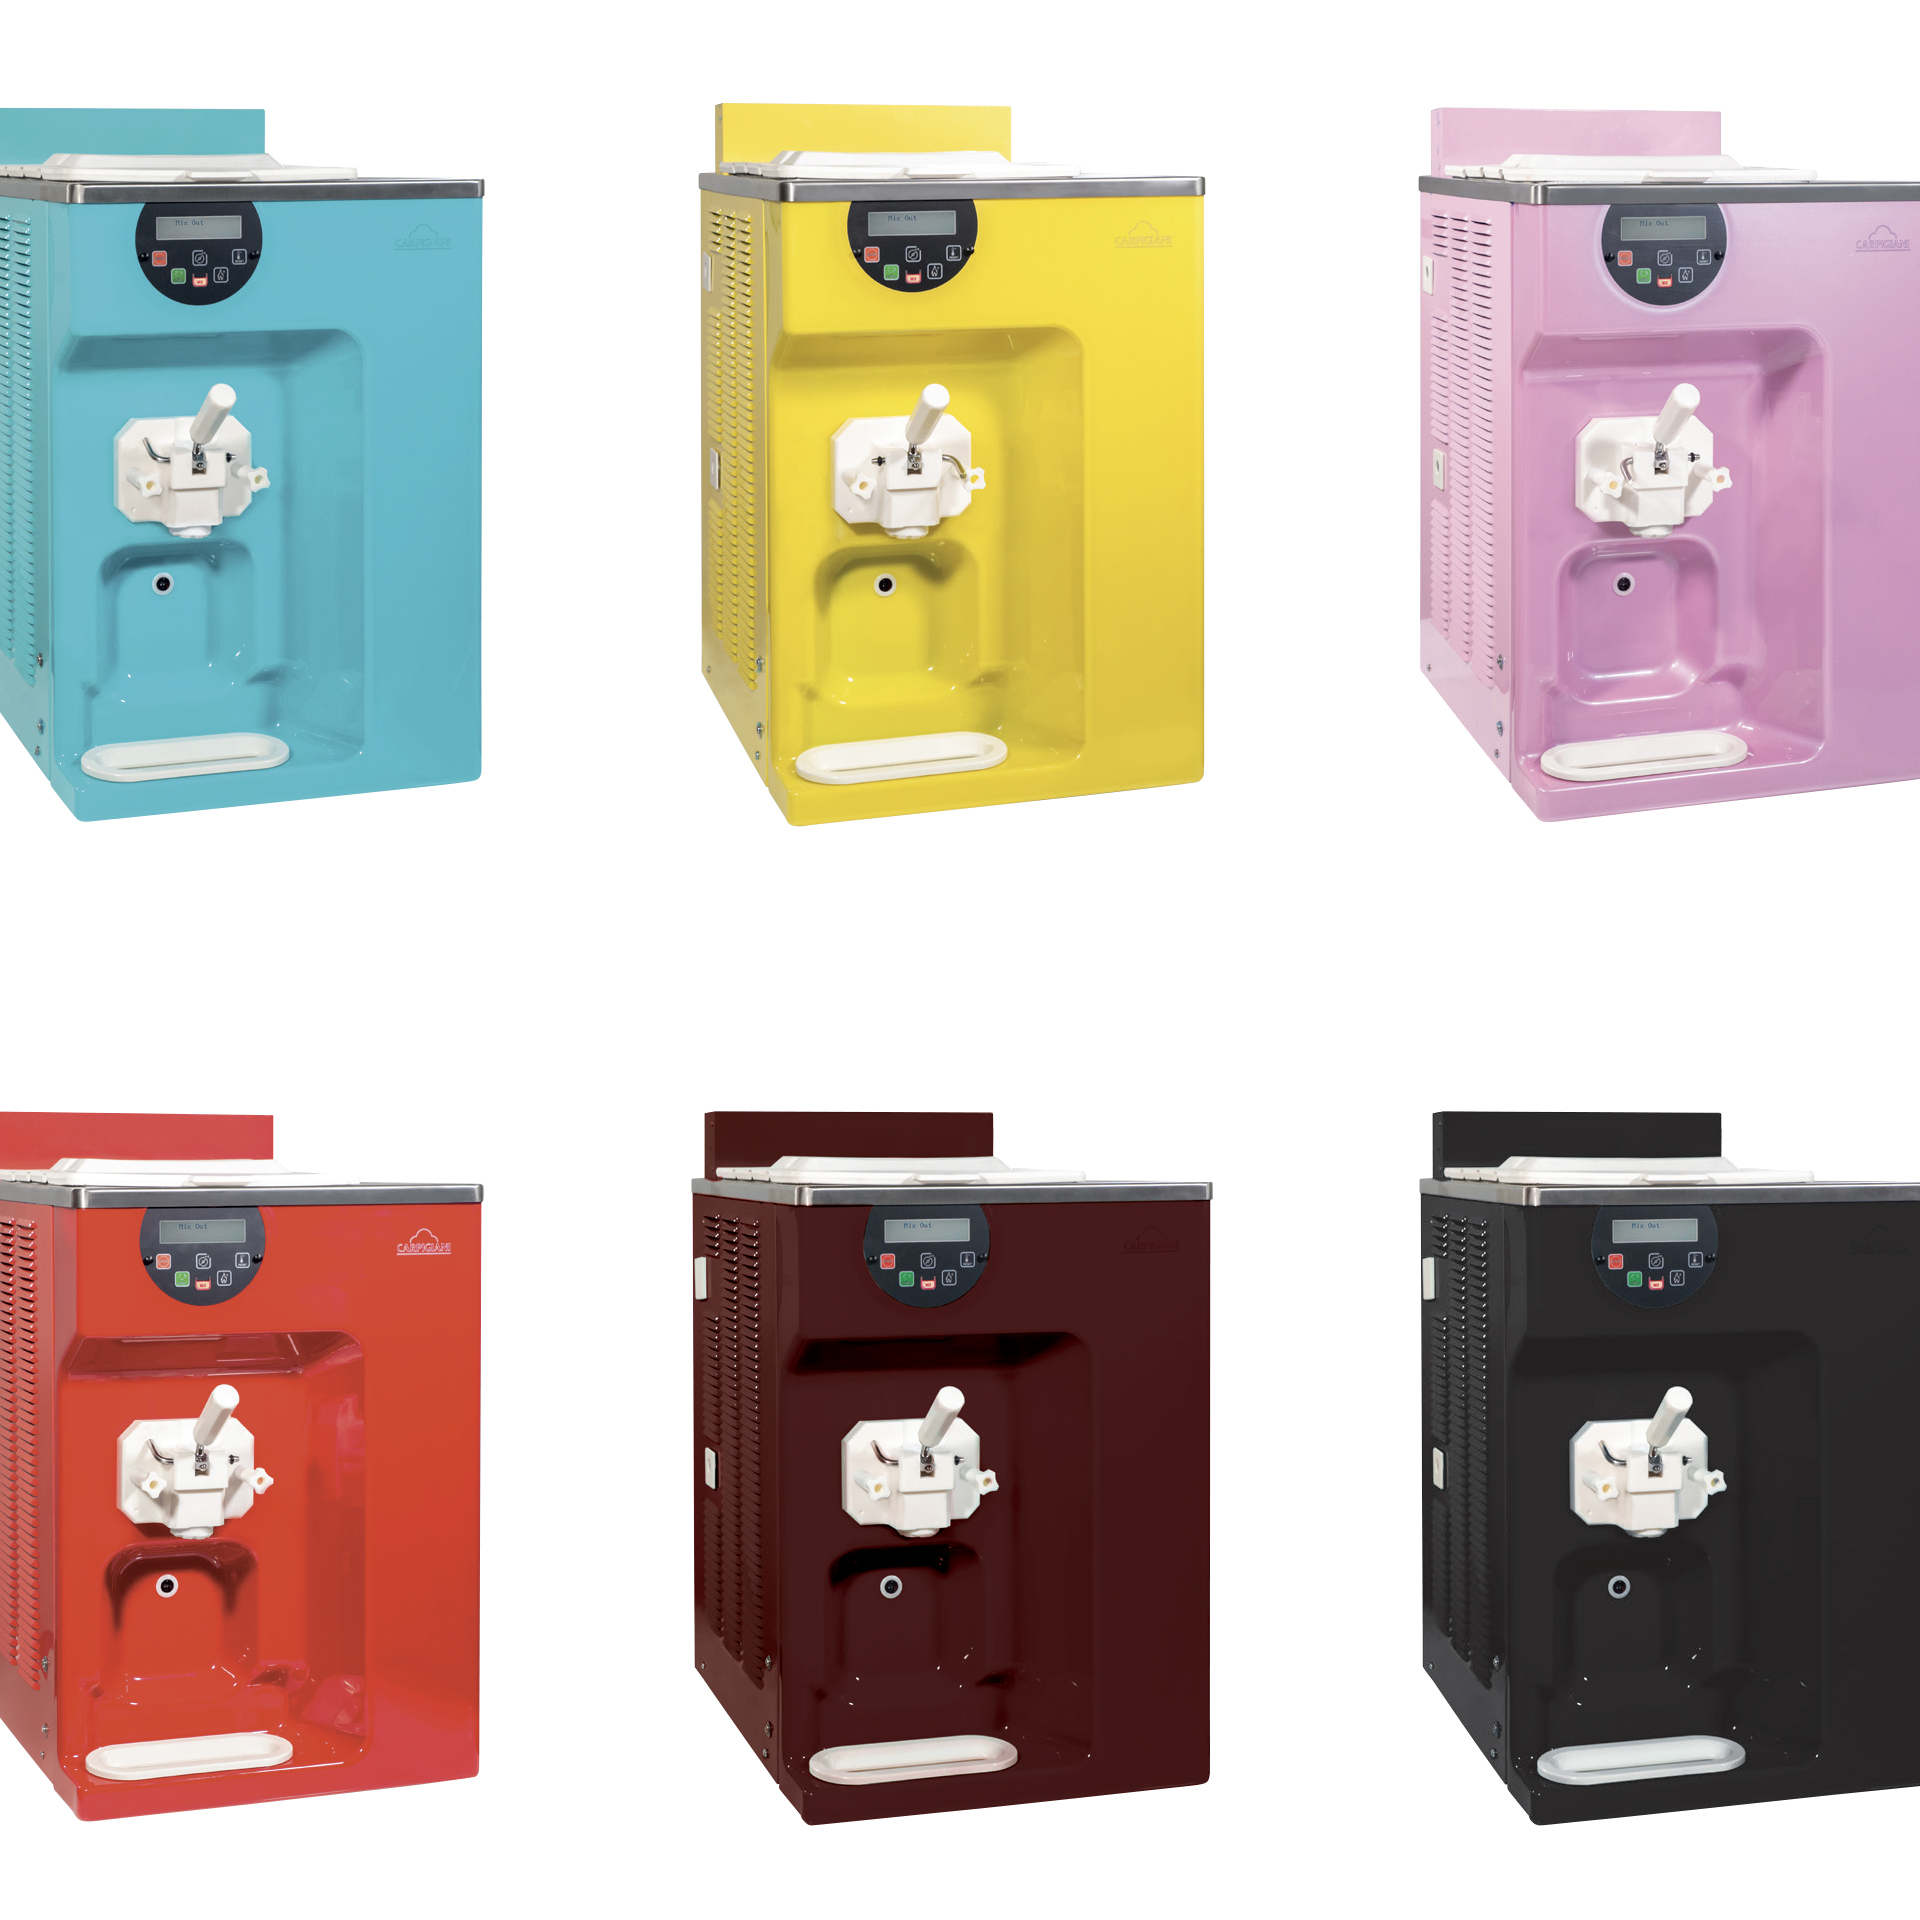 Carpigiani Soft Serve Machine - available colors for machine personalization